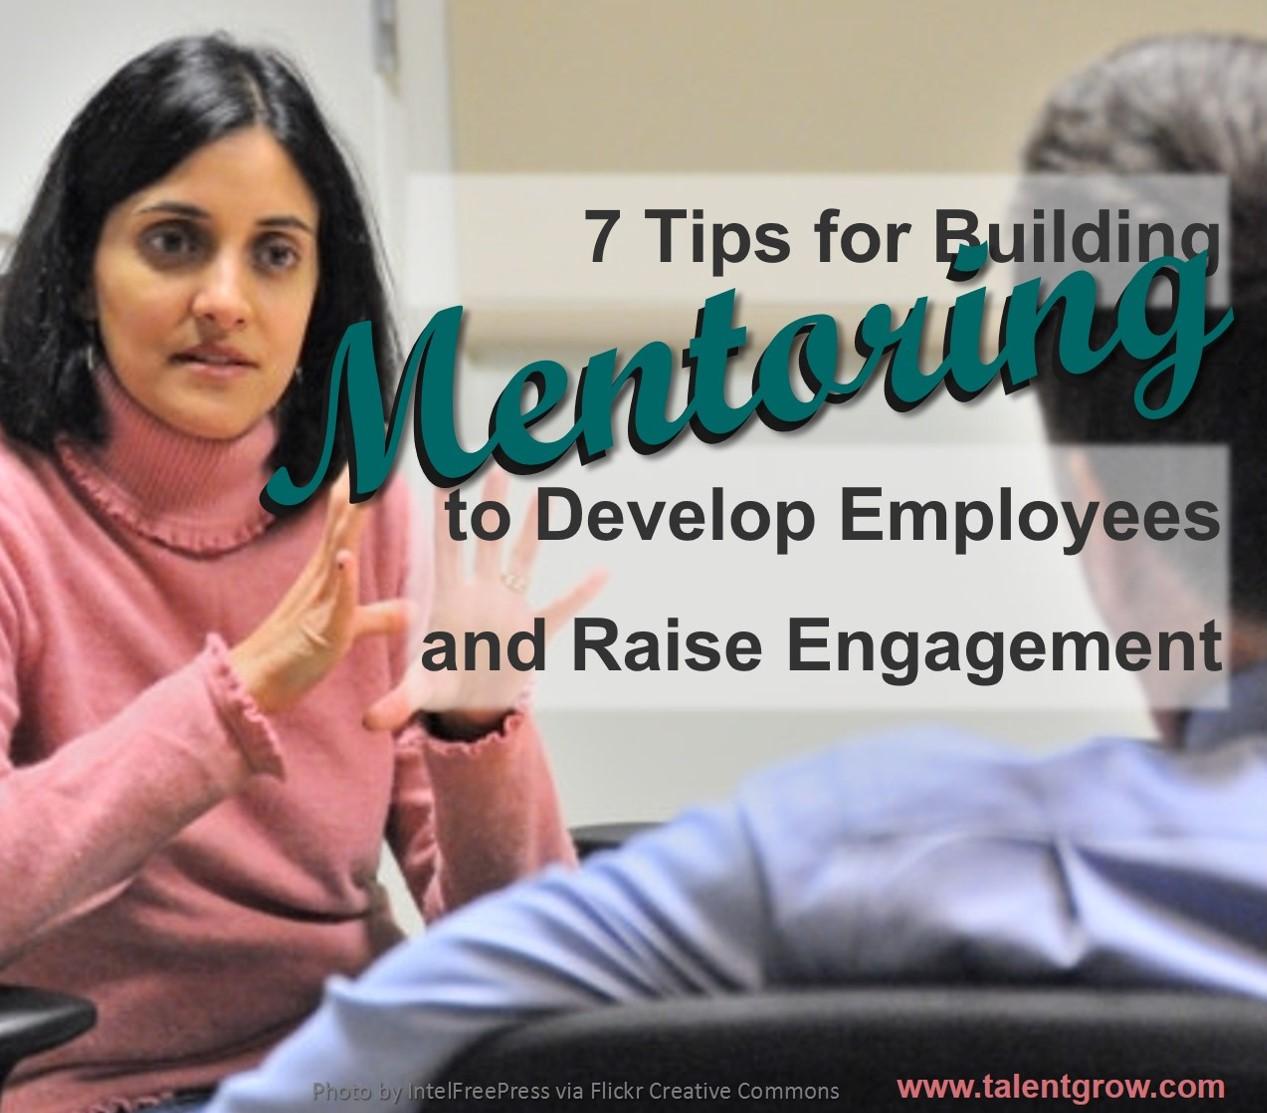 7 tips for building mentoring